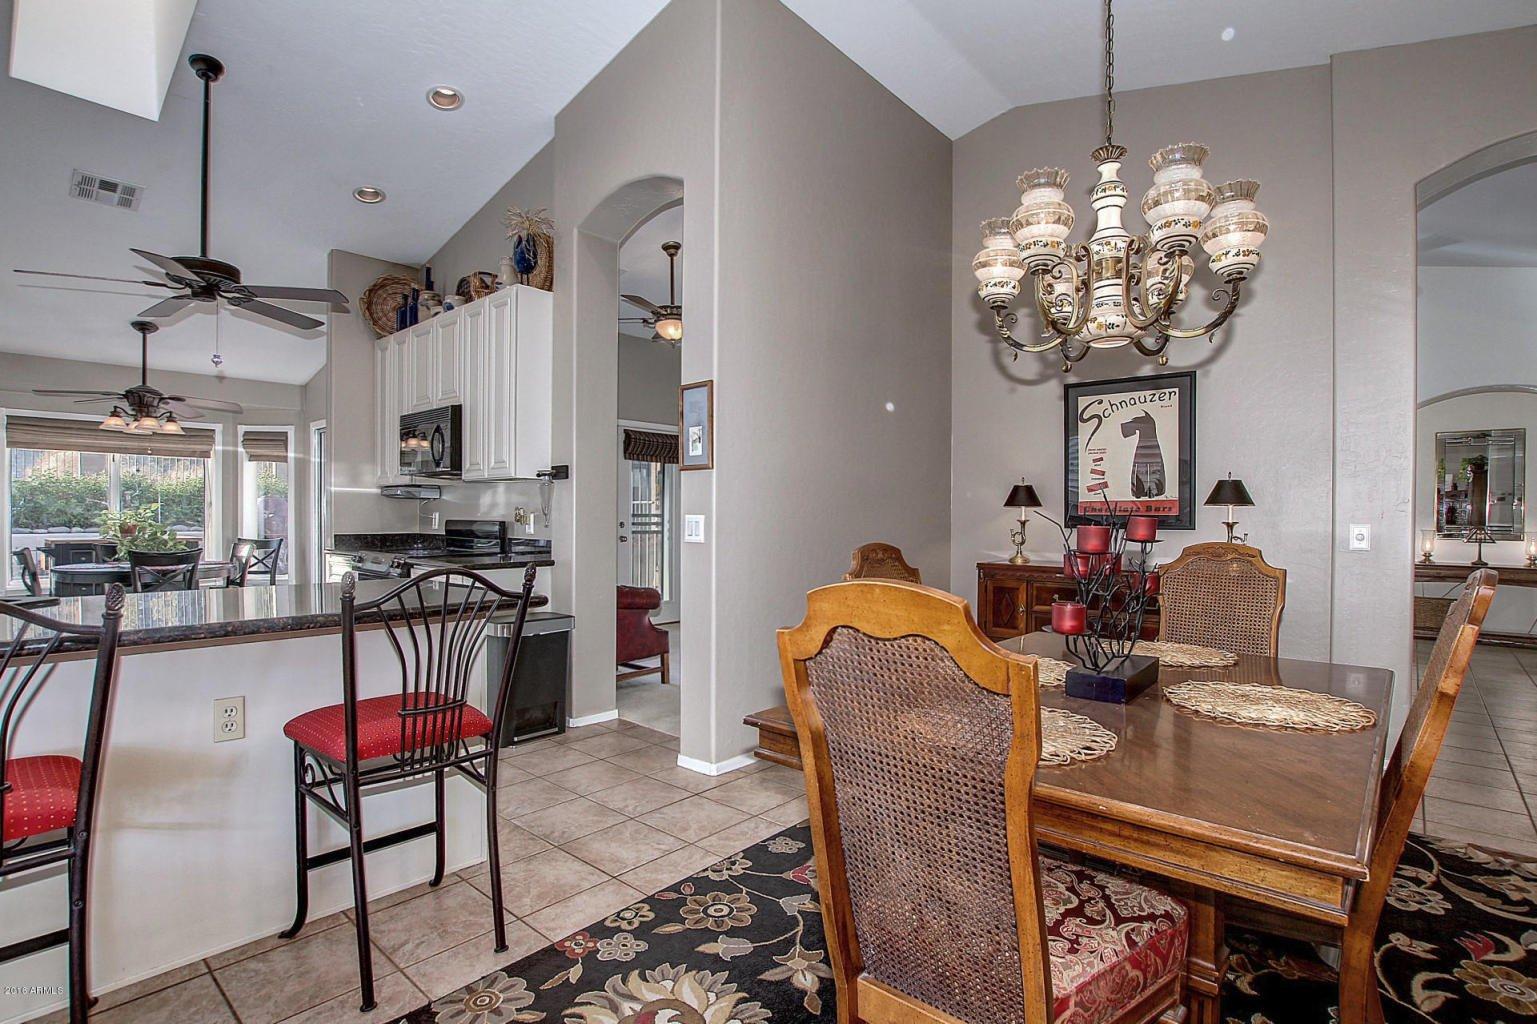 Photo 9: Photos: 3602 E Mountain Sky Avenue in Phoenix: Ahwatukee House for sale : MLS®# 5462780